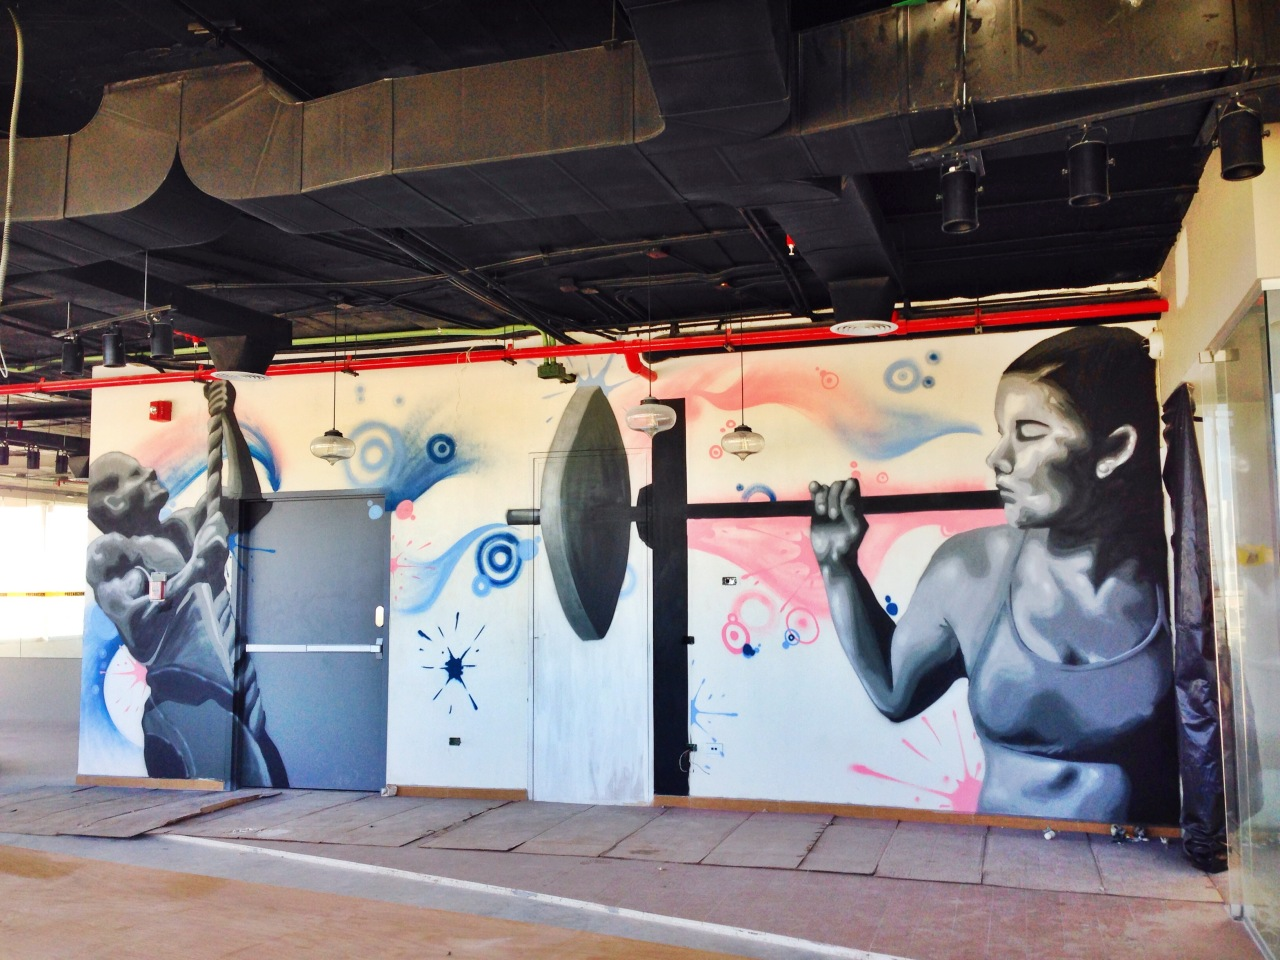 El arte del graffiti, el arteurbano.